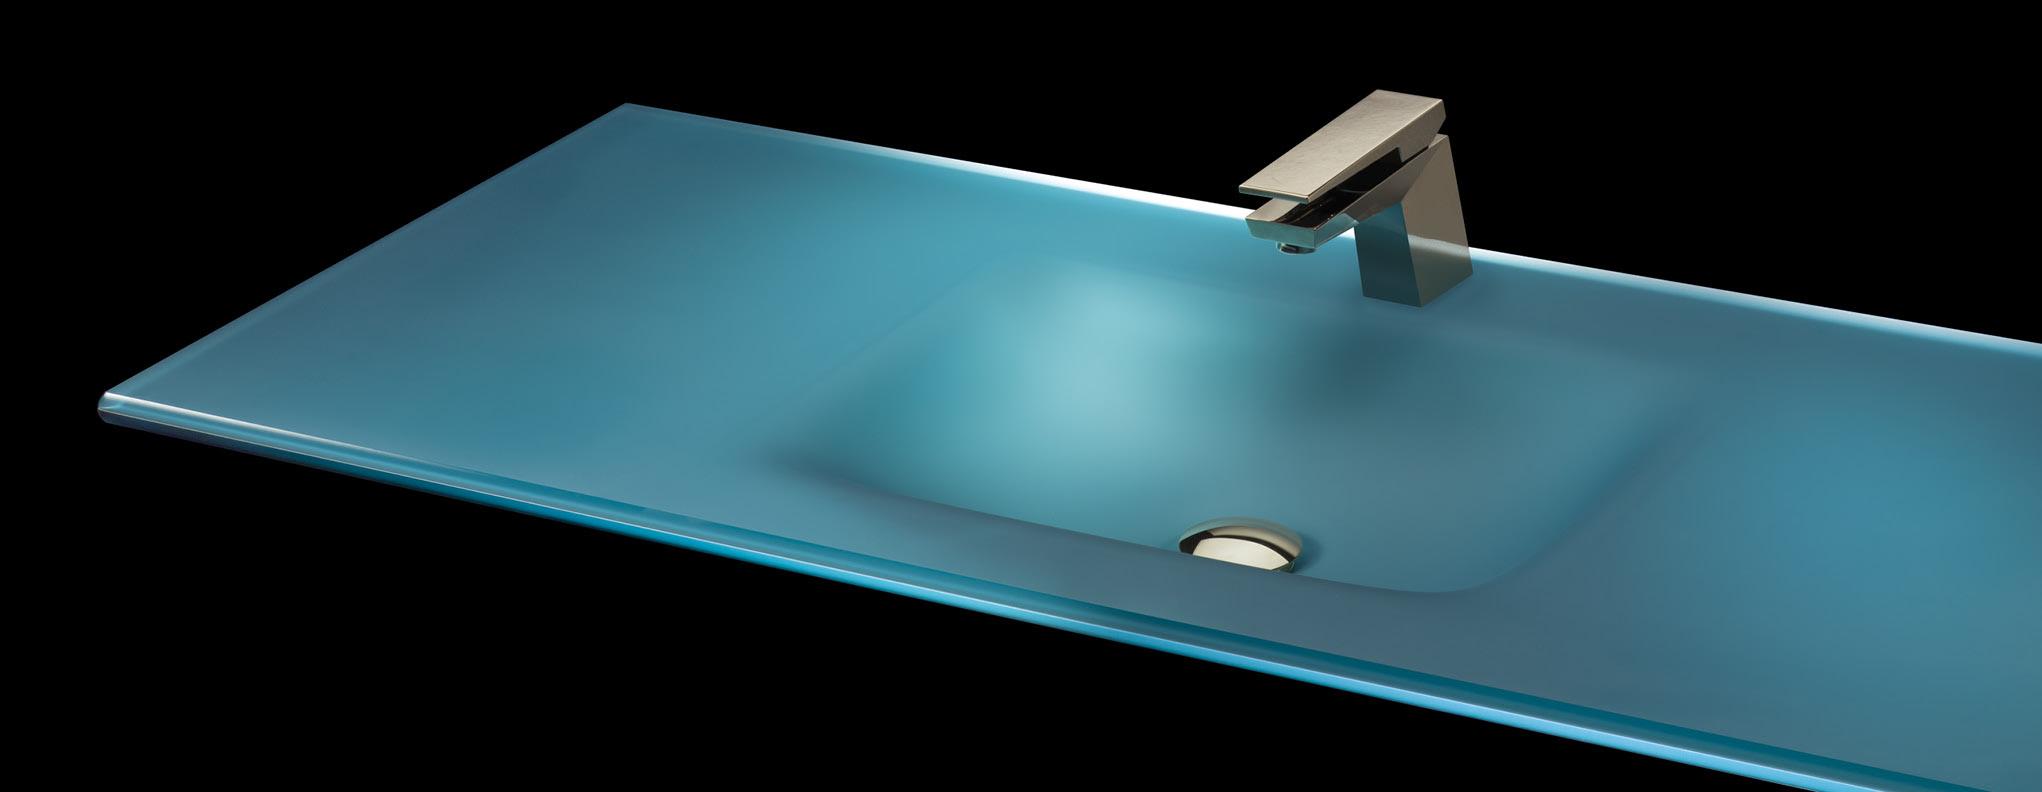 The Original Glass Sink Vitraform